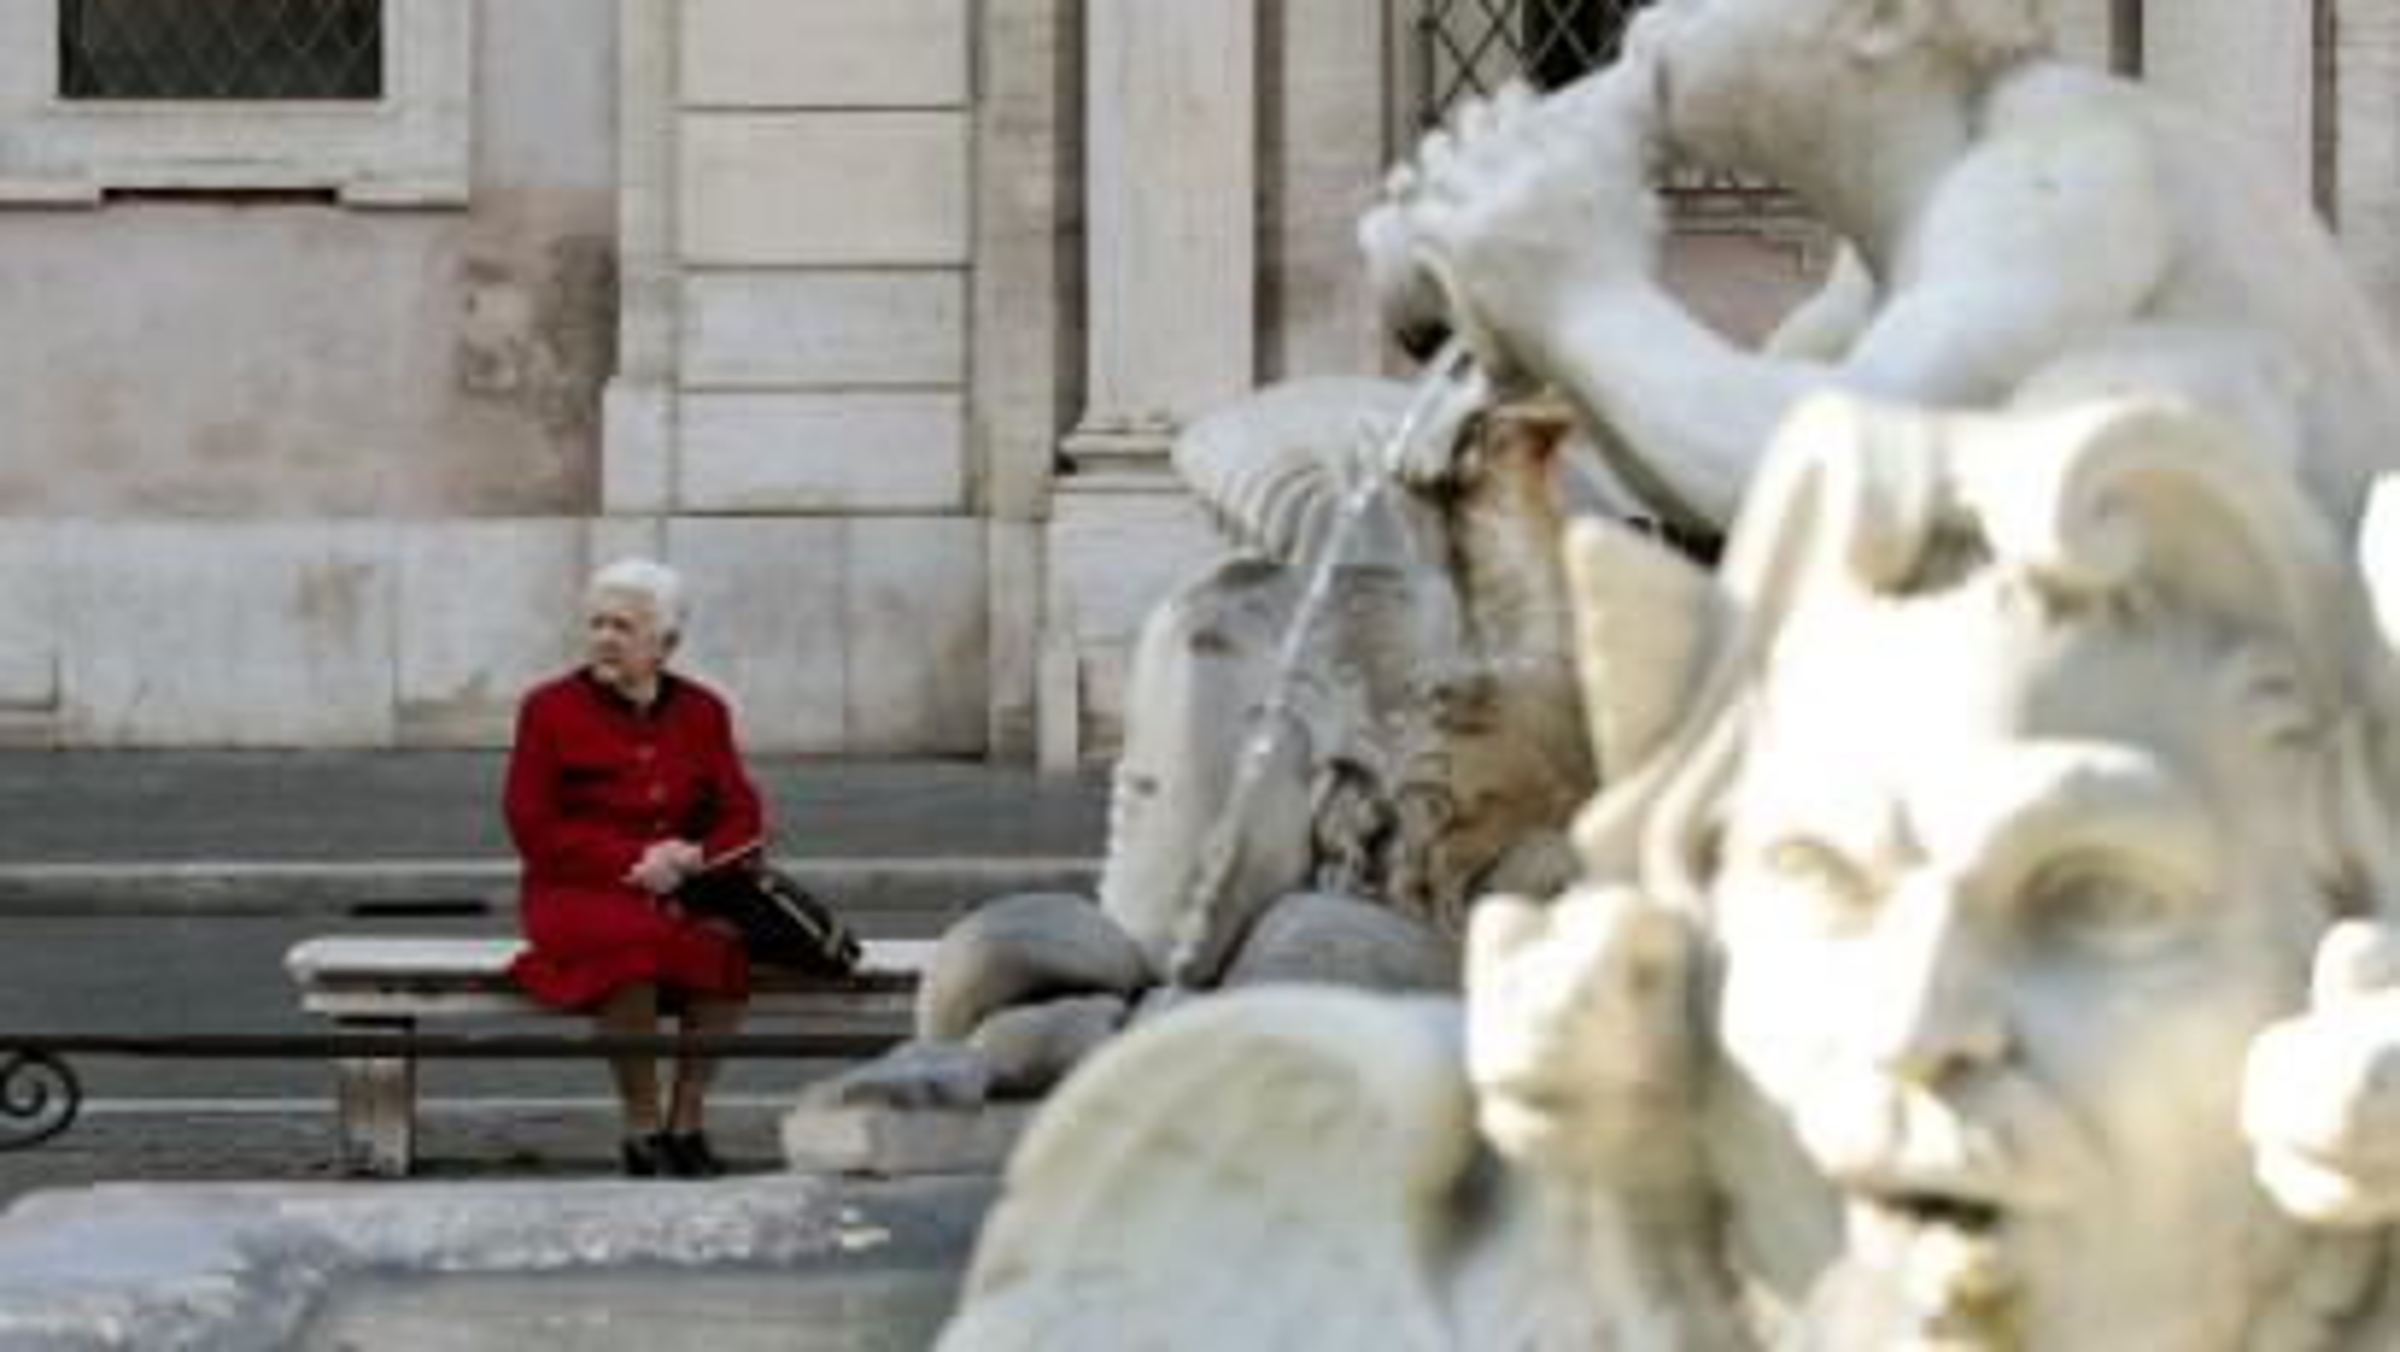 A woman sits near Piazza Navona's Fontana del Moro in Rome.